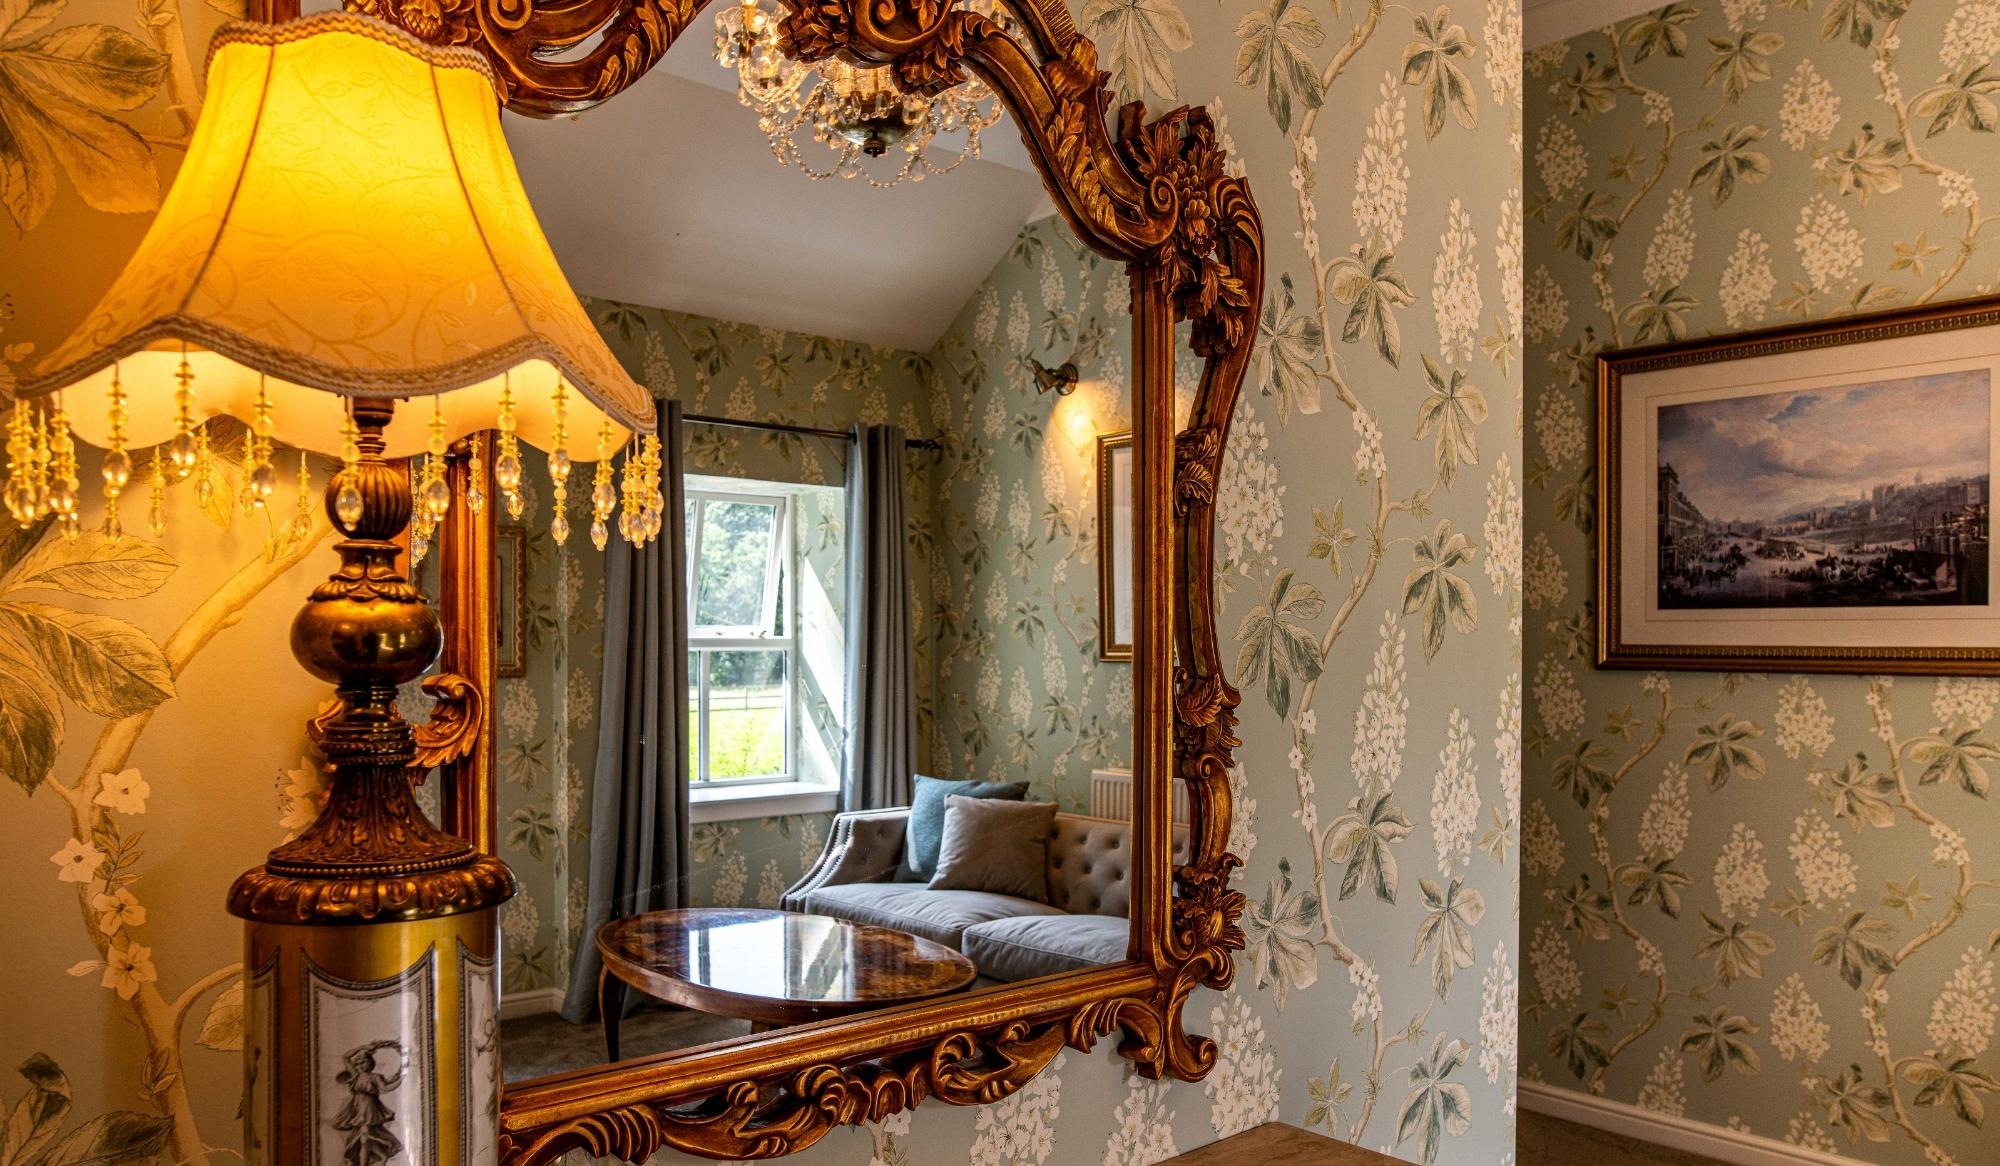 1 Bed Suite at Melville Castle